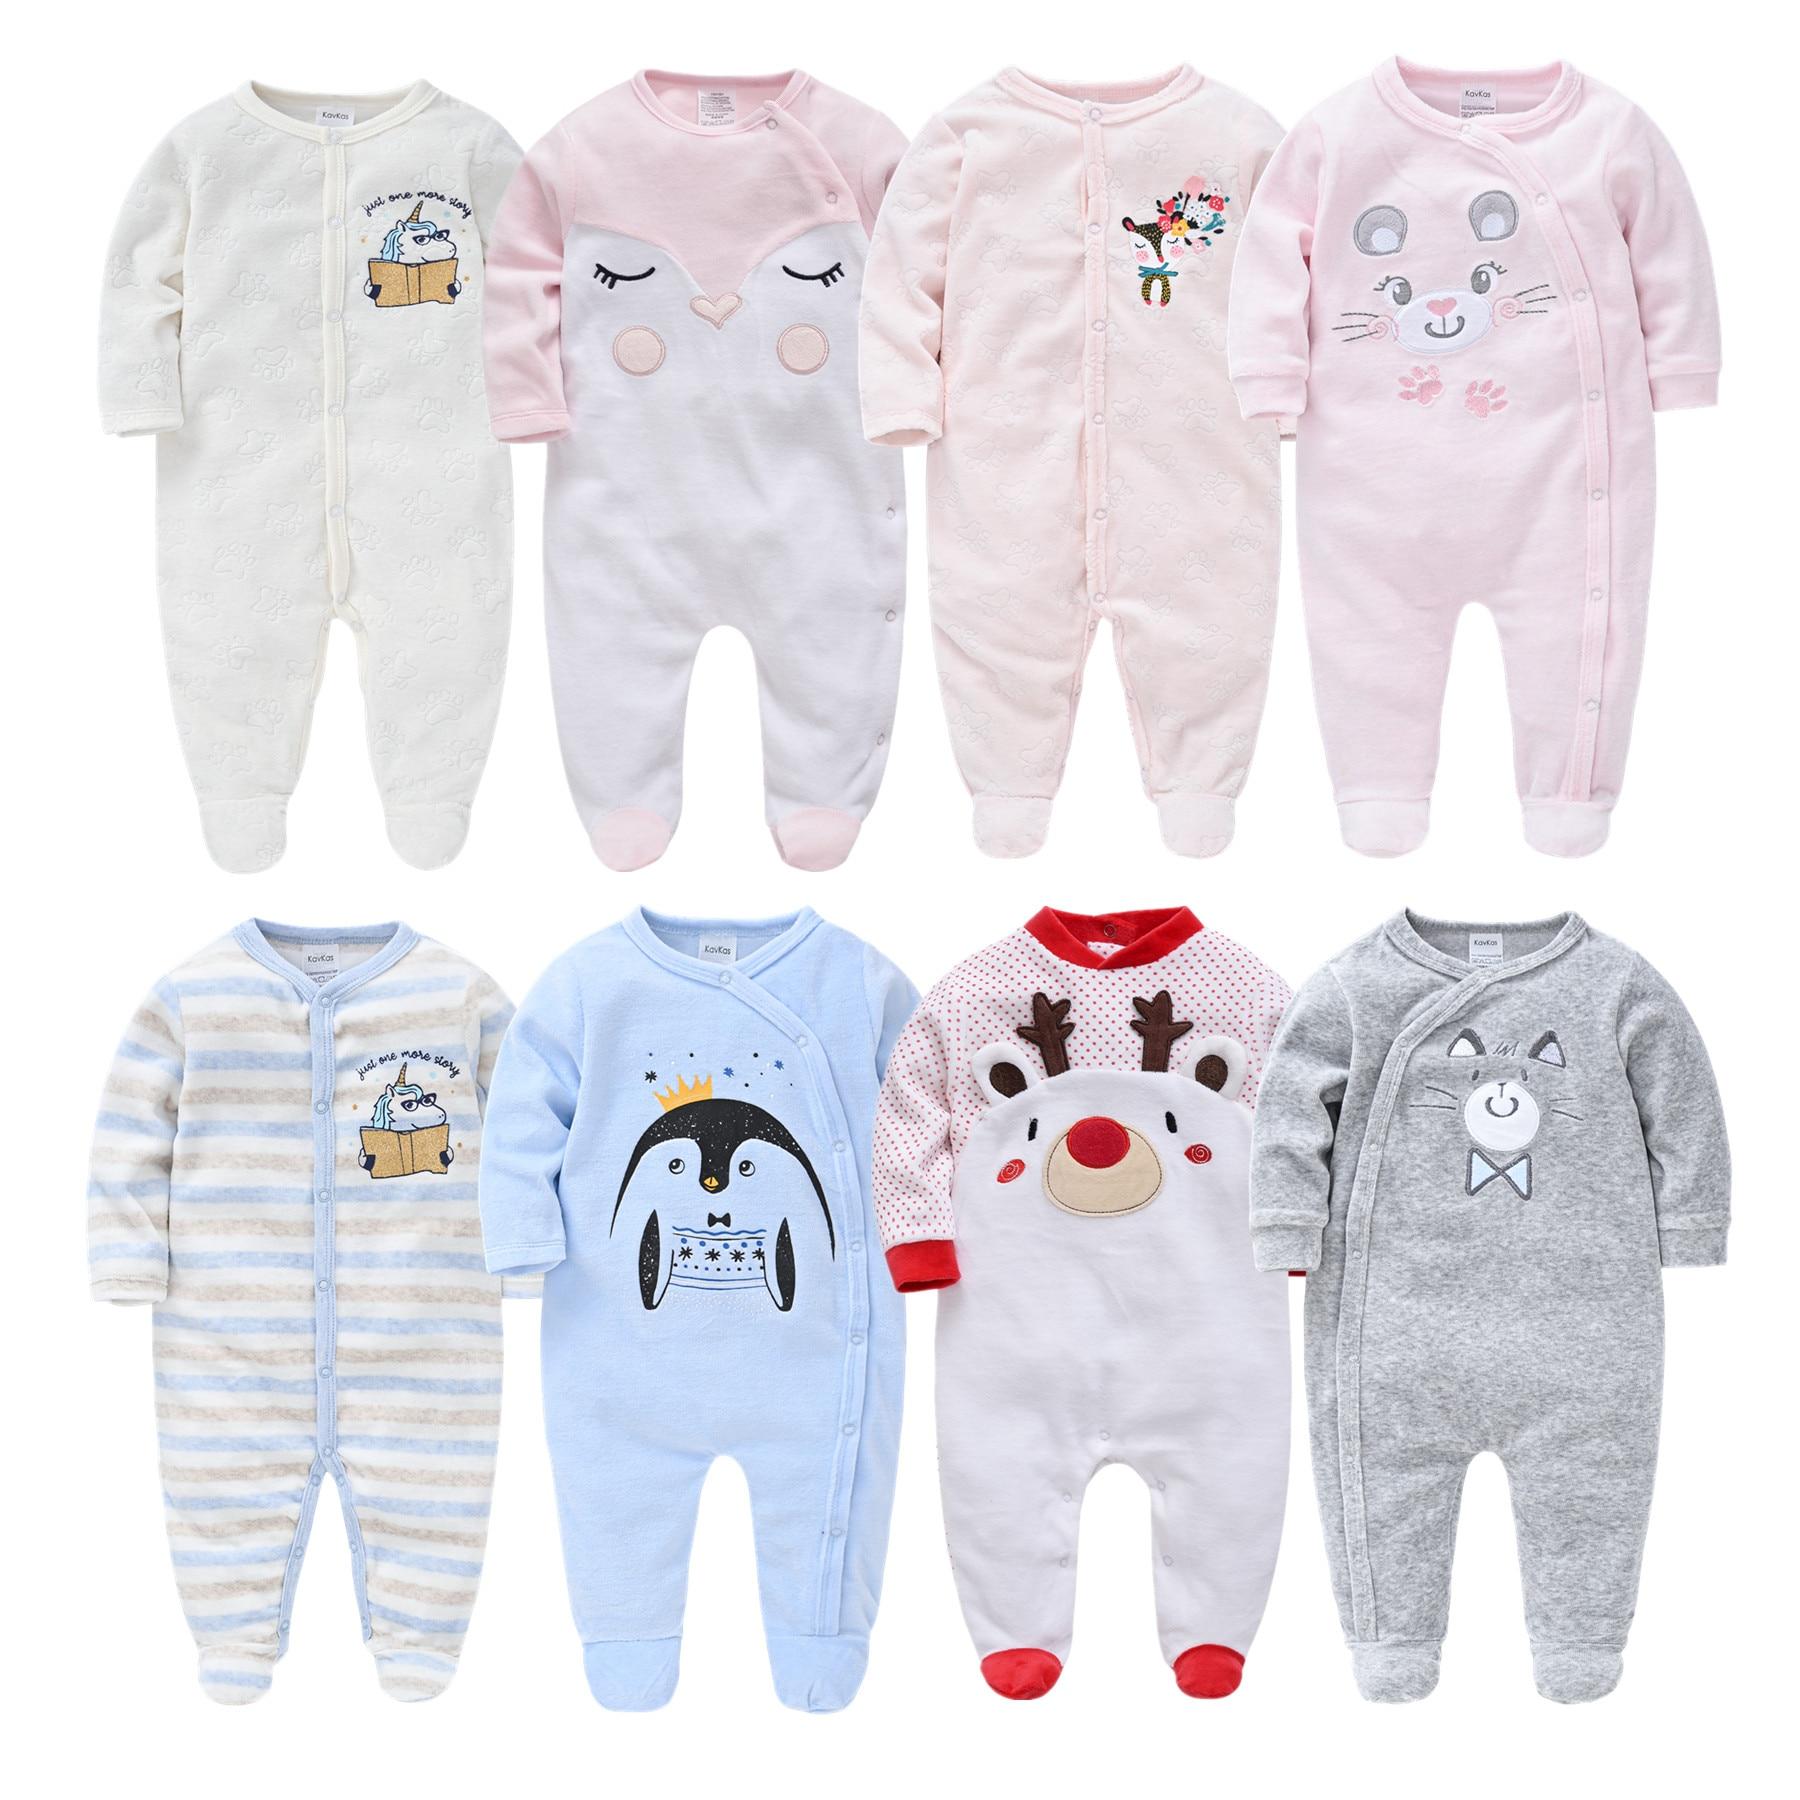 Unisex Winter Autumn Newborn Baby Rompers Pjiamas Infant Onesies Velvet Warm Jumpsuit Baby Boys Overalls Toddler Girls Clothing